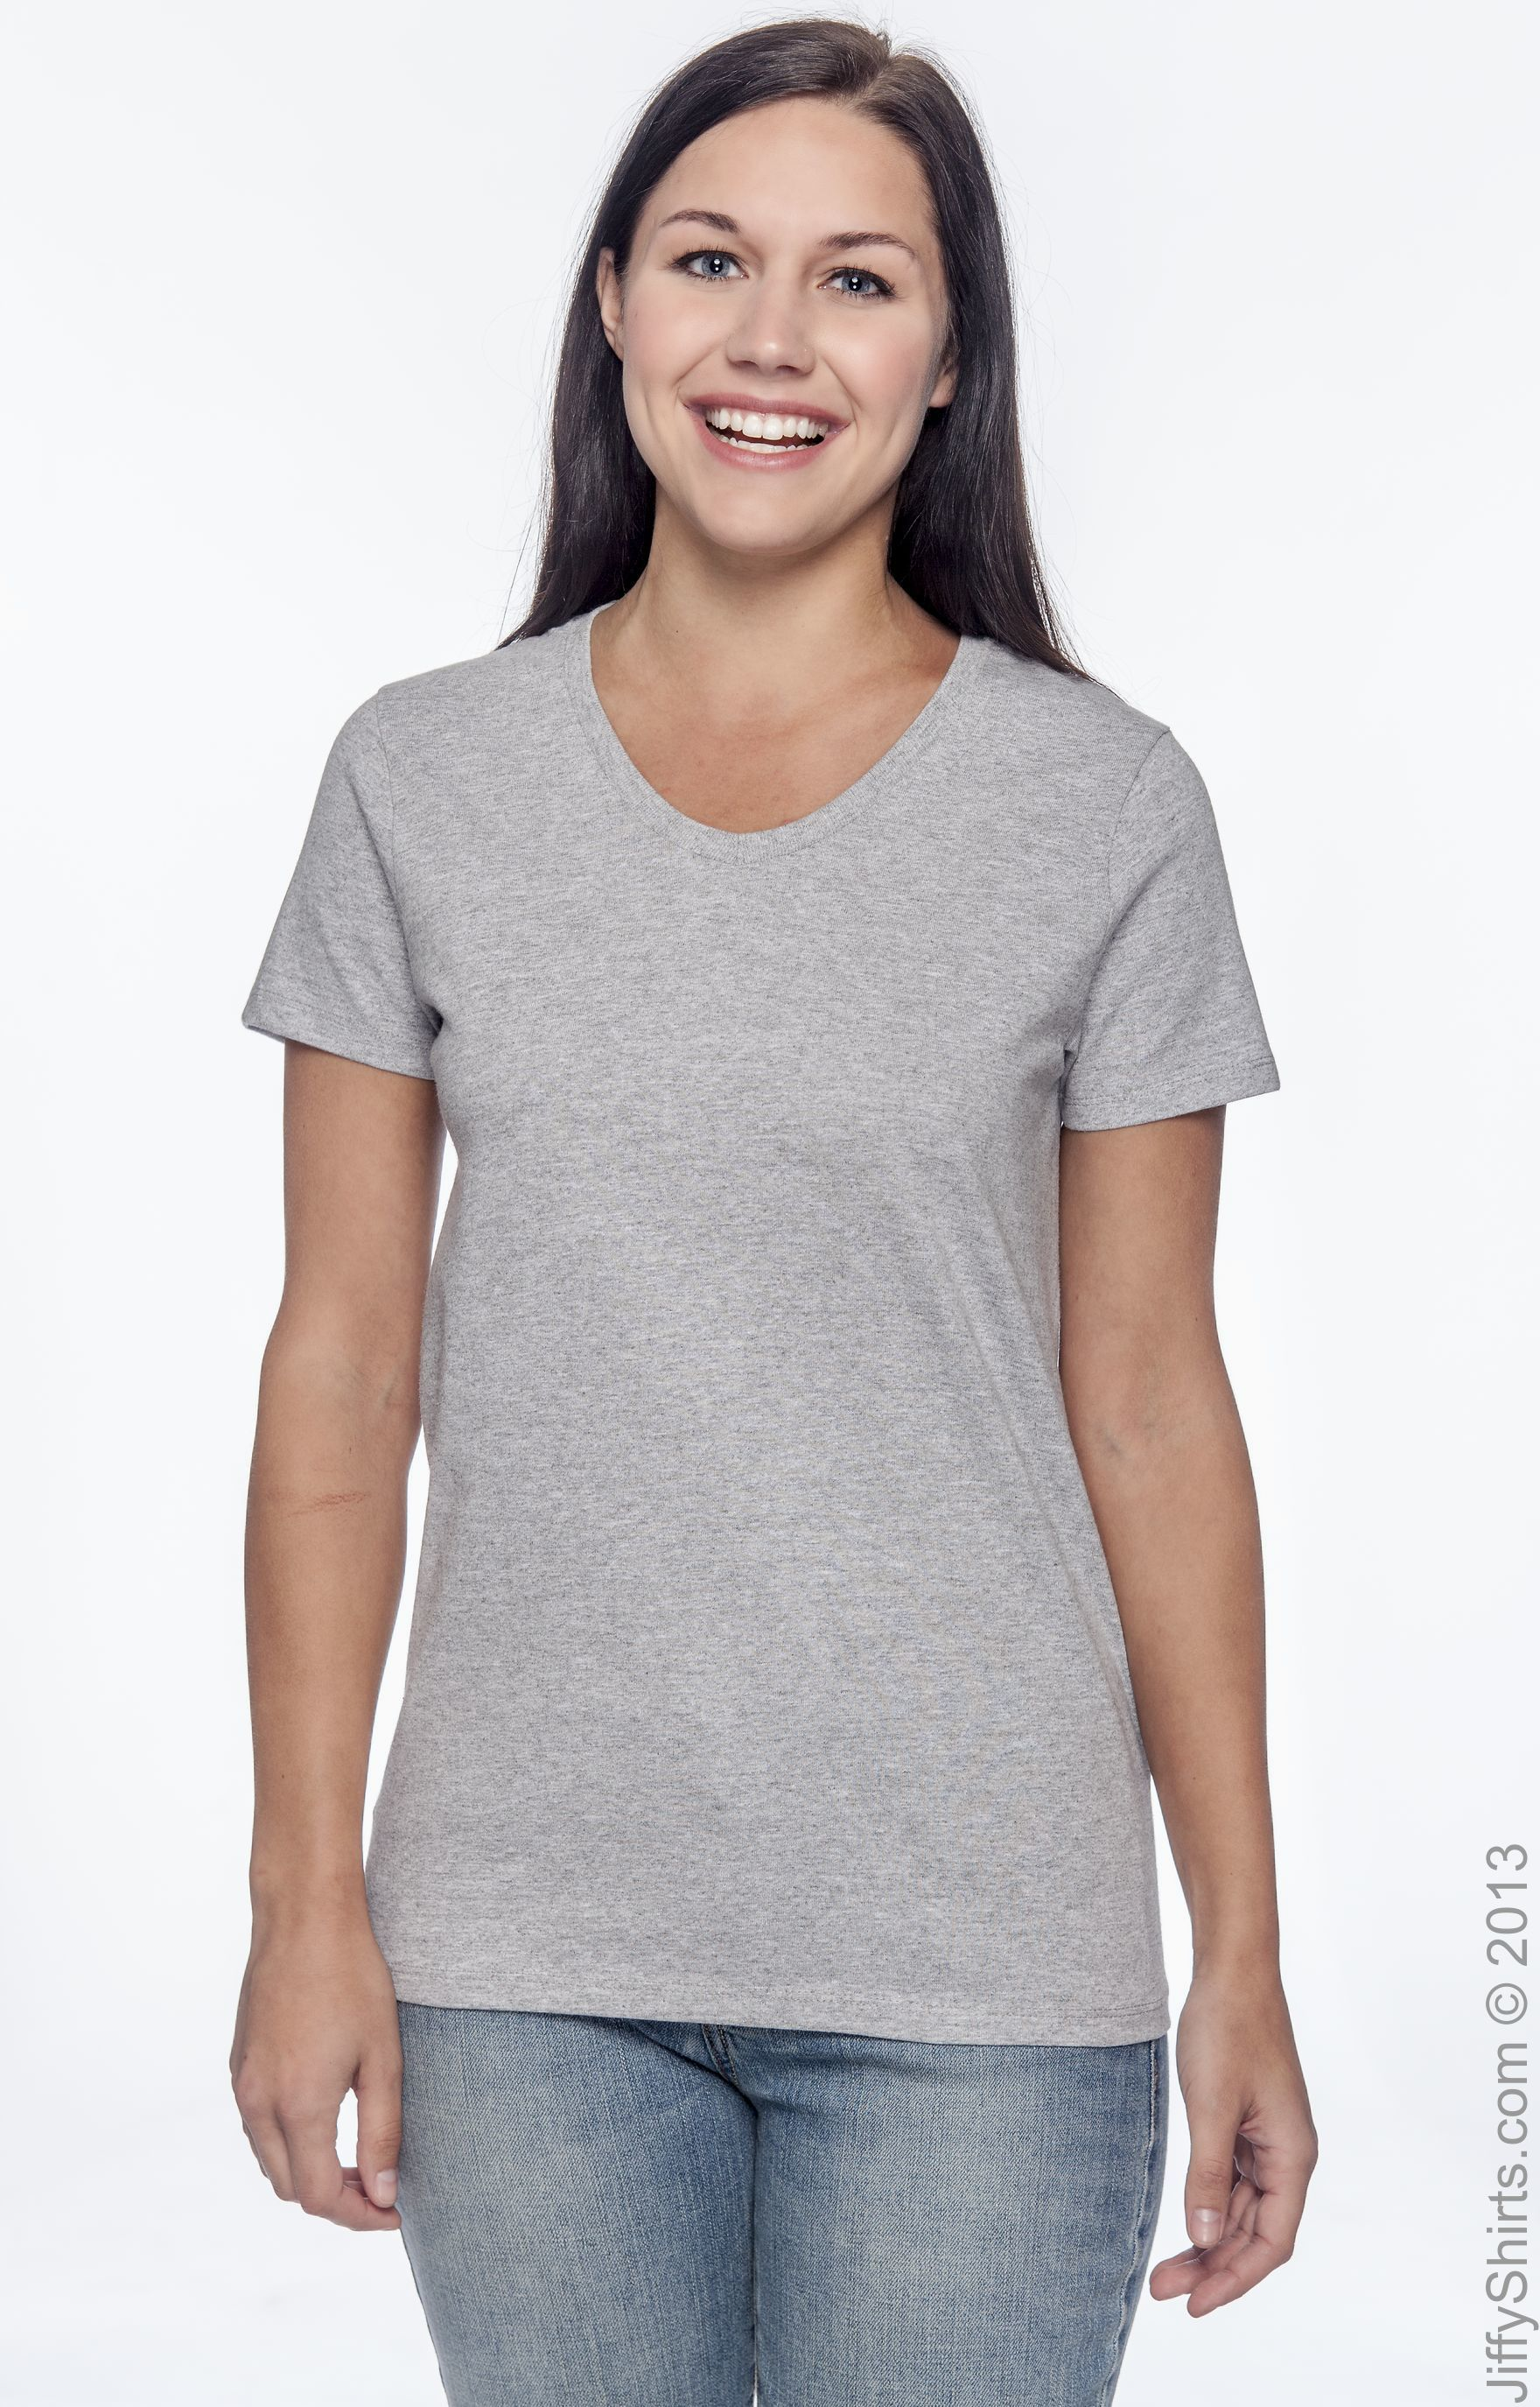 Hanes Ladies ComfortSoft V-Neck Short Sleeve T-Shirt Women/'s S M L XL 2XL  5780